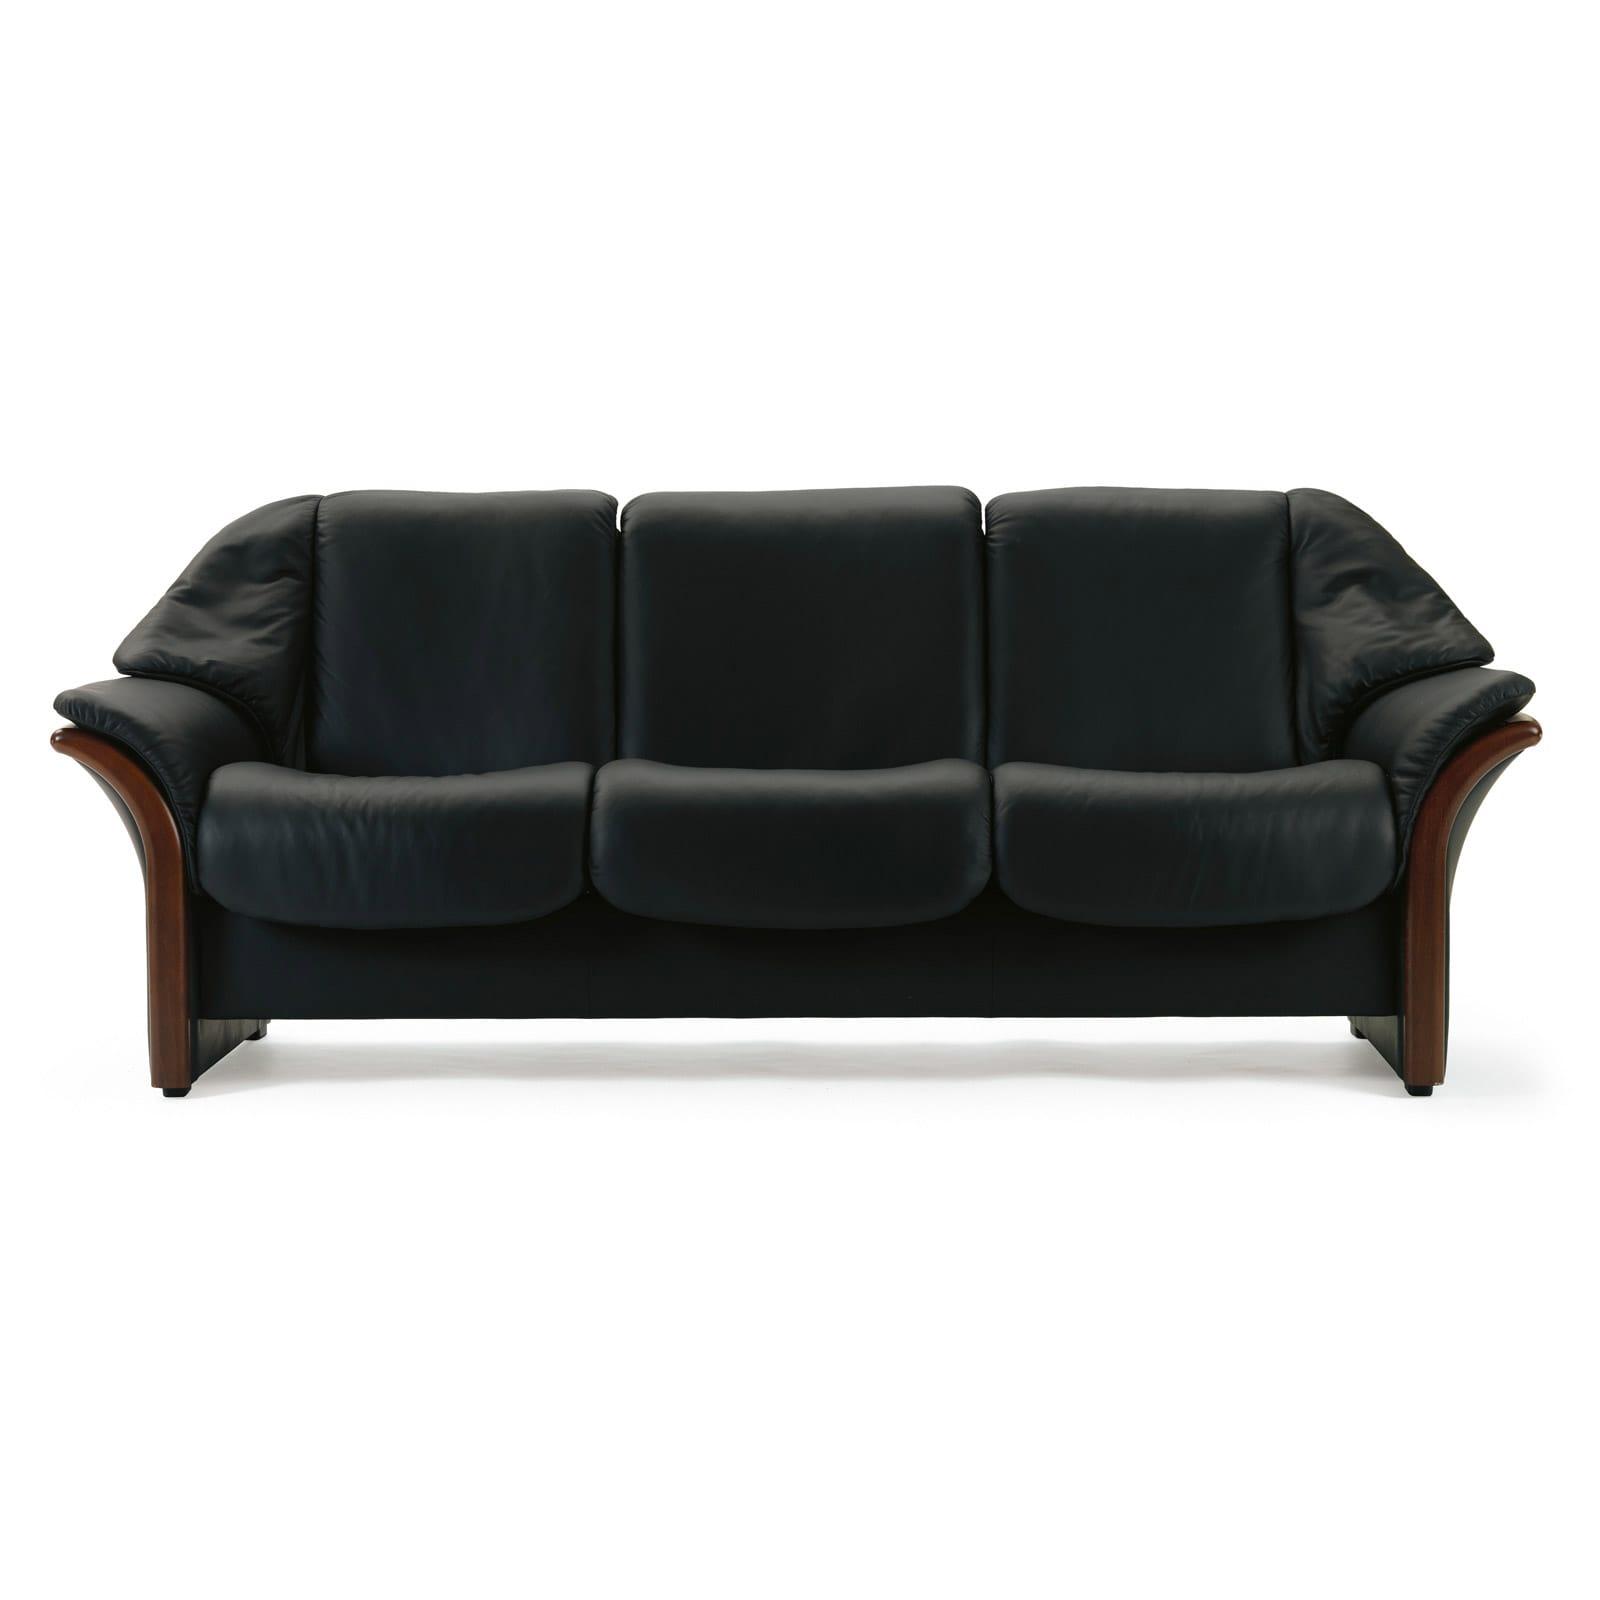 stressless sofa 3 sitzer eldorado m niedrig black braun. Black Bedroom Furniture Sets. Home Design Ideas